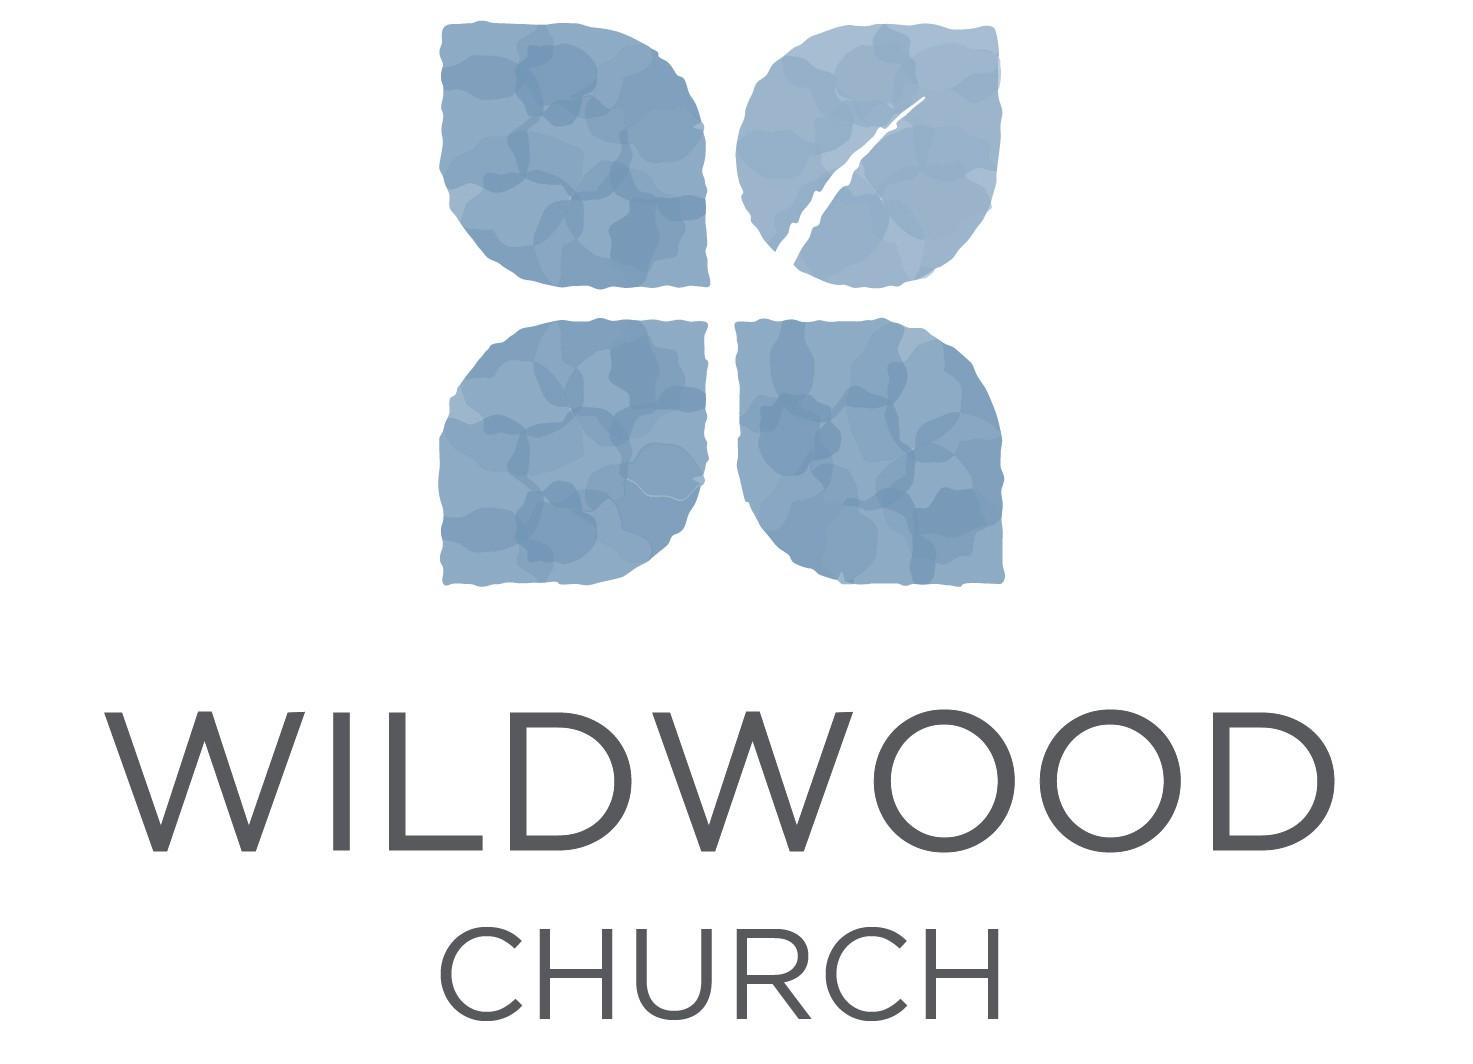 Design a modern logo and mark for a community-focused church